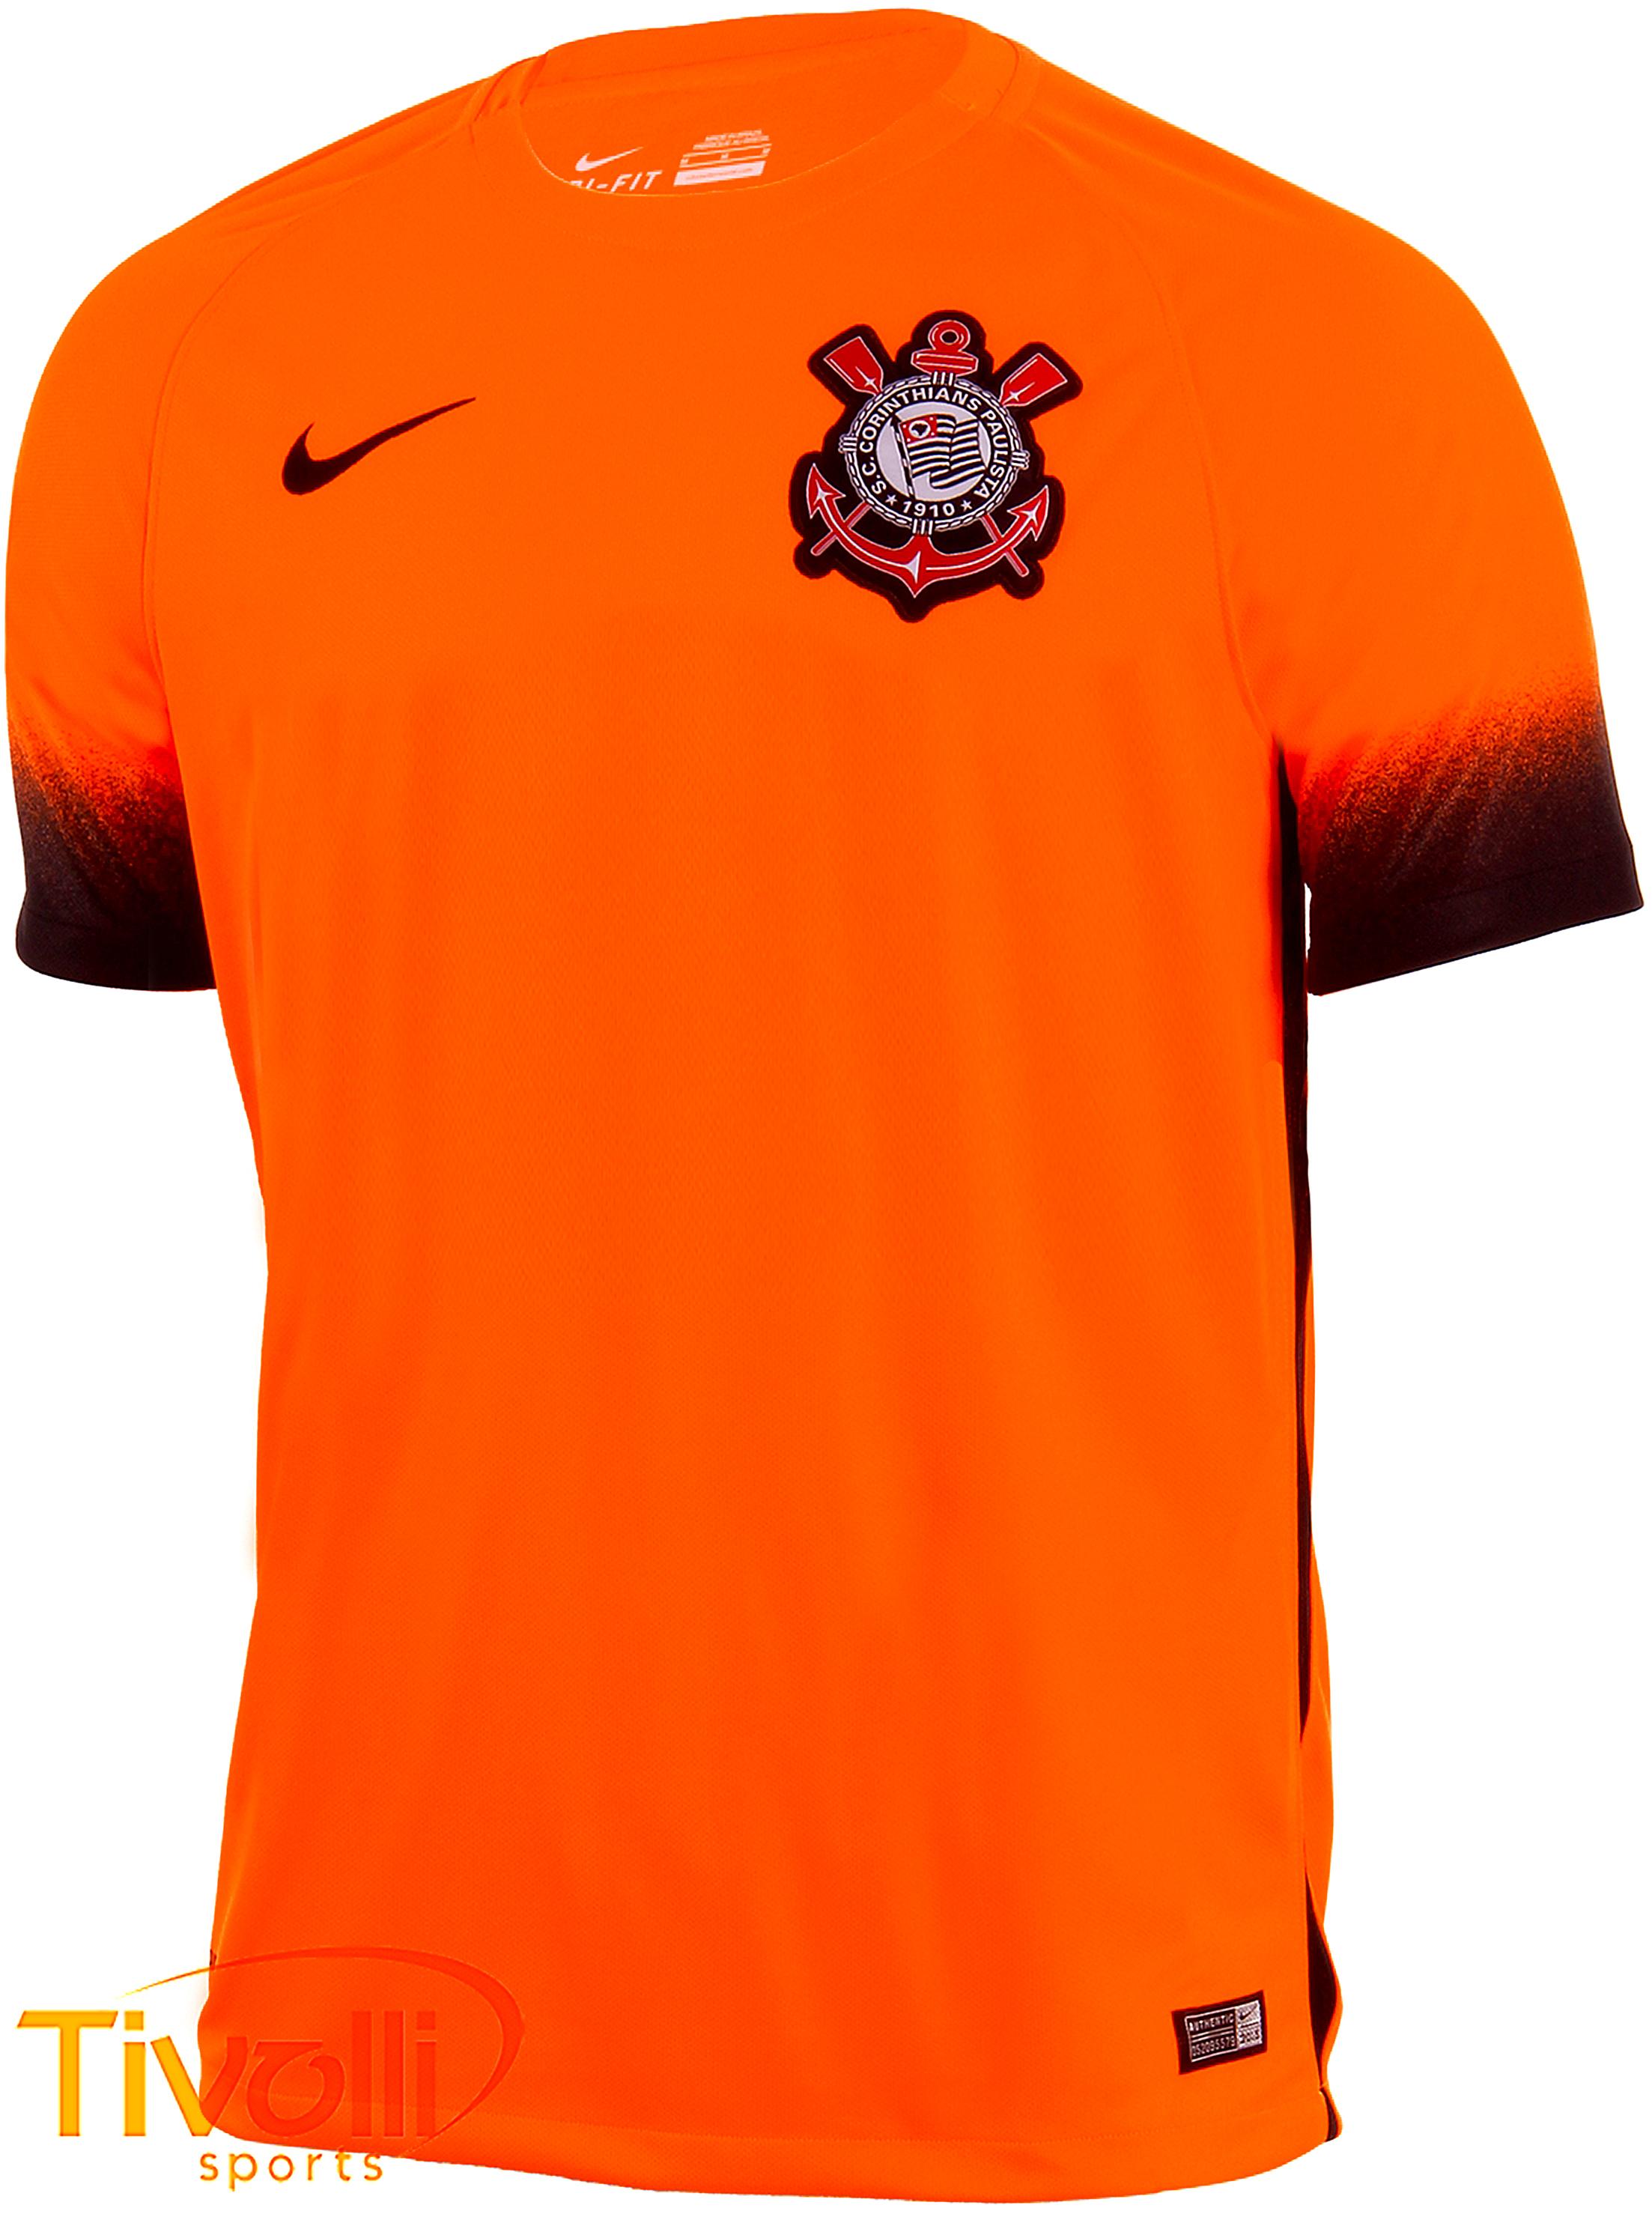 69e79fe886ccf Black Friday - Camisa Corinthians III Infantil torcedor 2015 2016 Nike  infantil laranja e preta